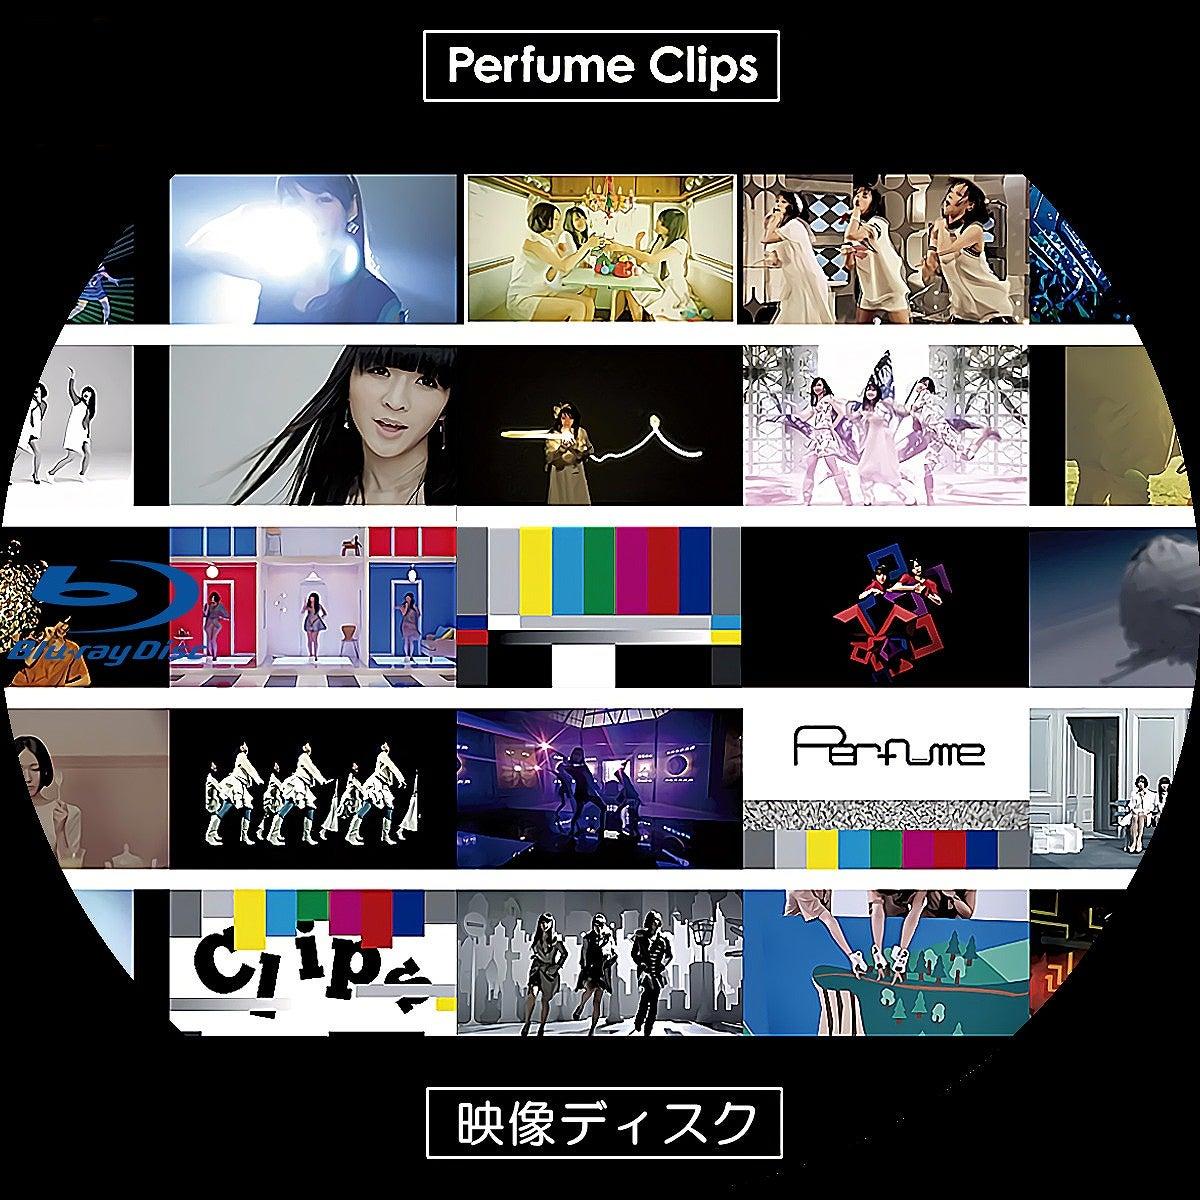 Perfume Clips DVDラベル